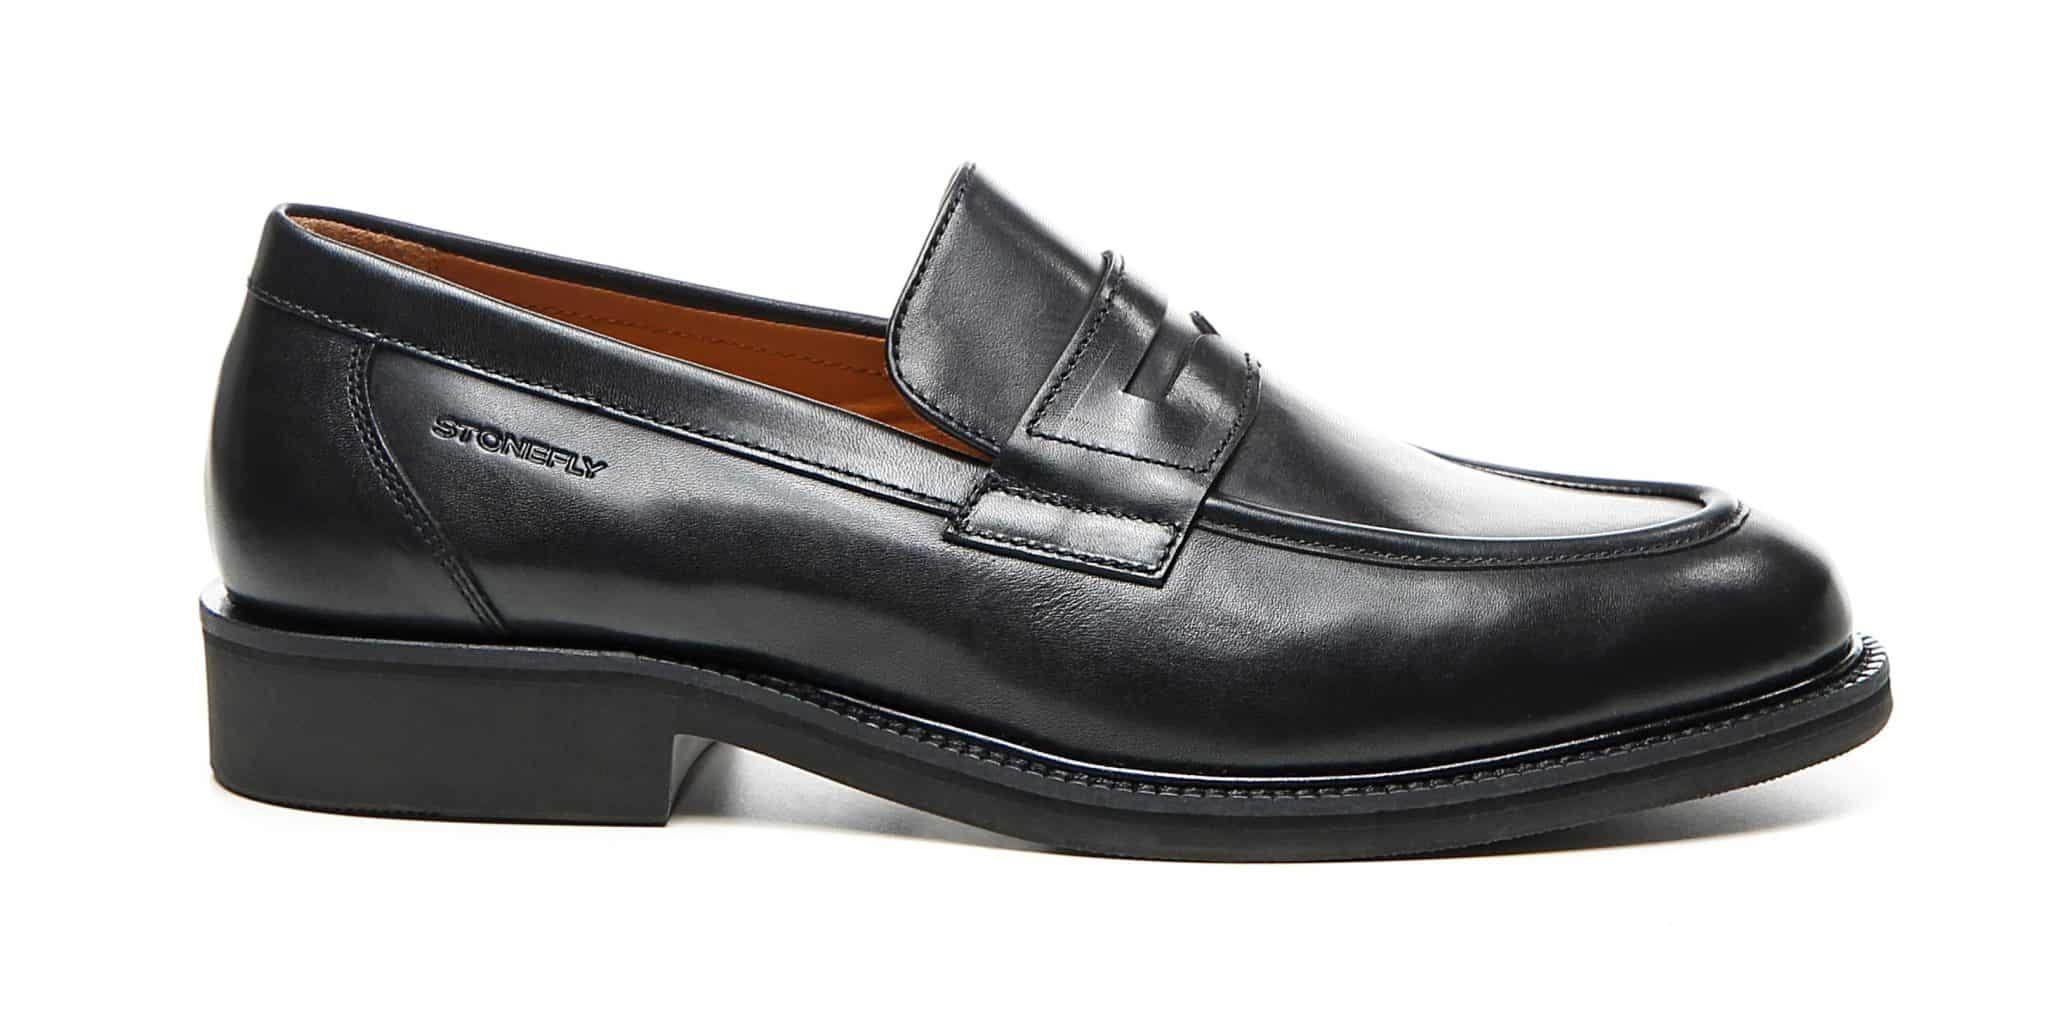 Stonefly scarpe uomo invernali 2018 2019 mocassini